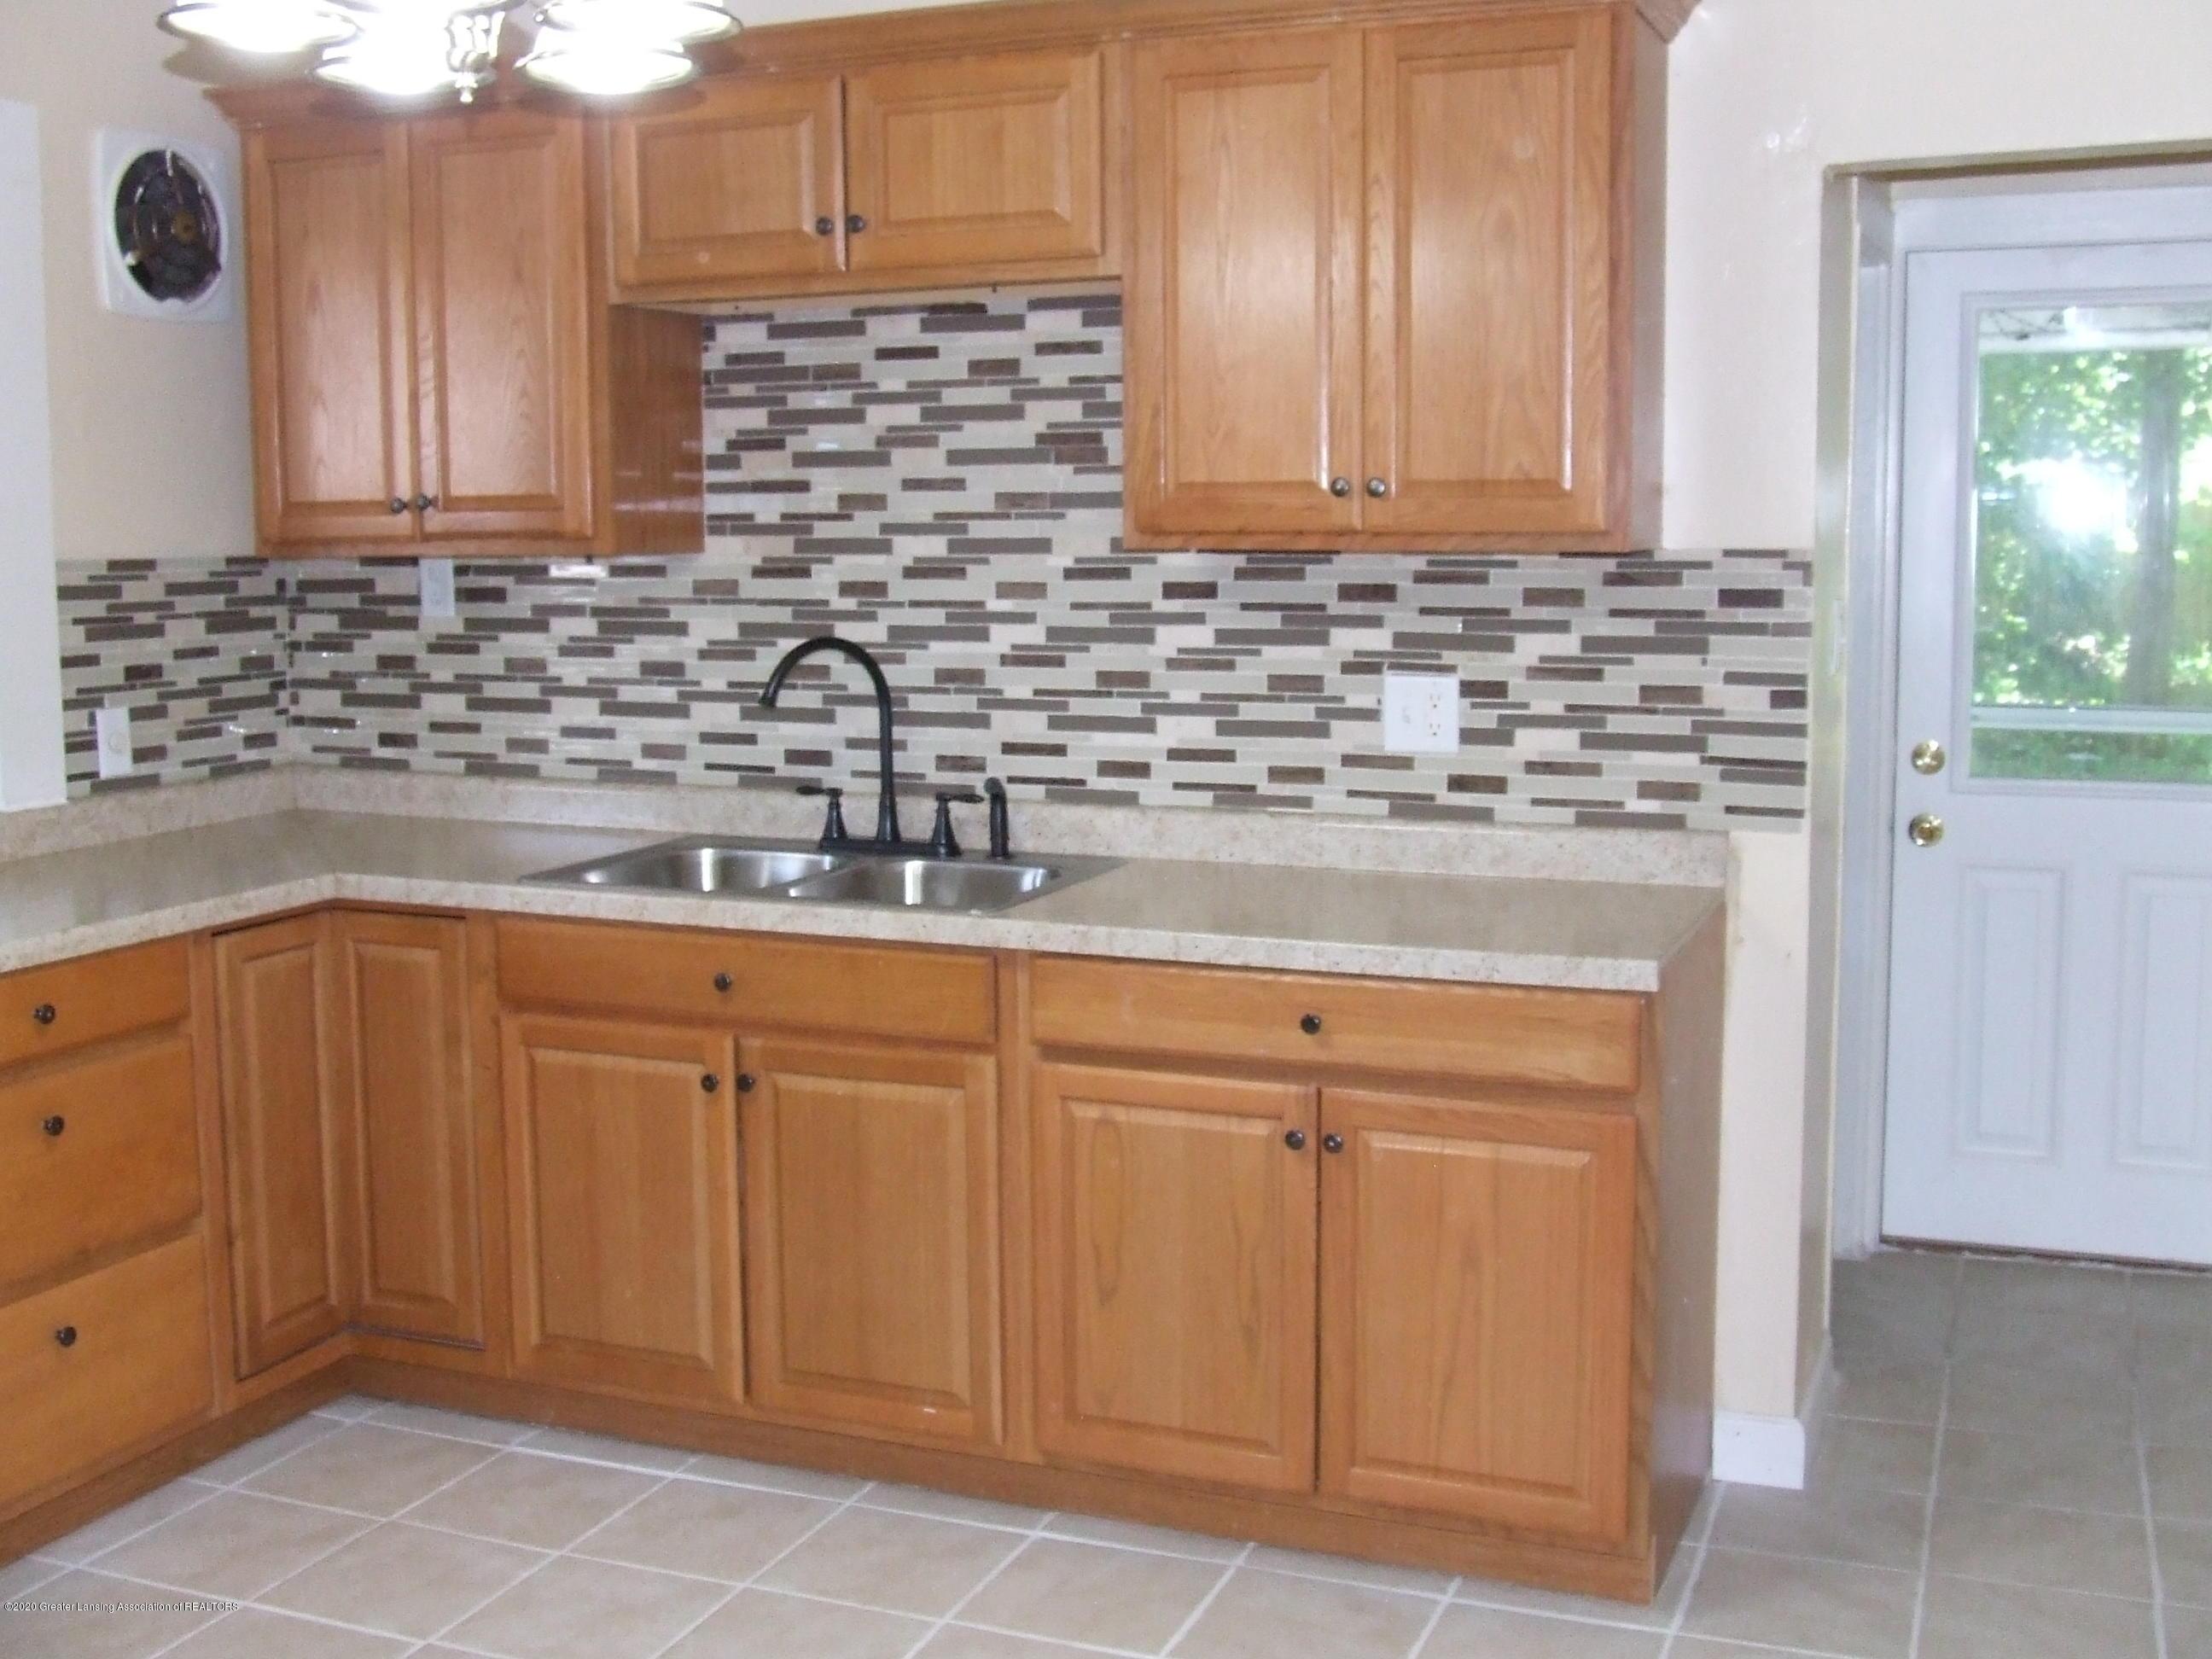 610 N Deerfield Ave - Kitchen - 2